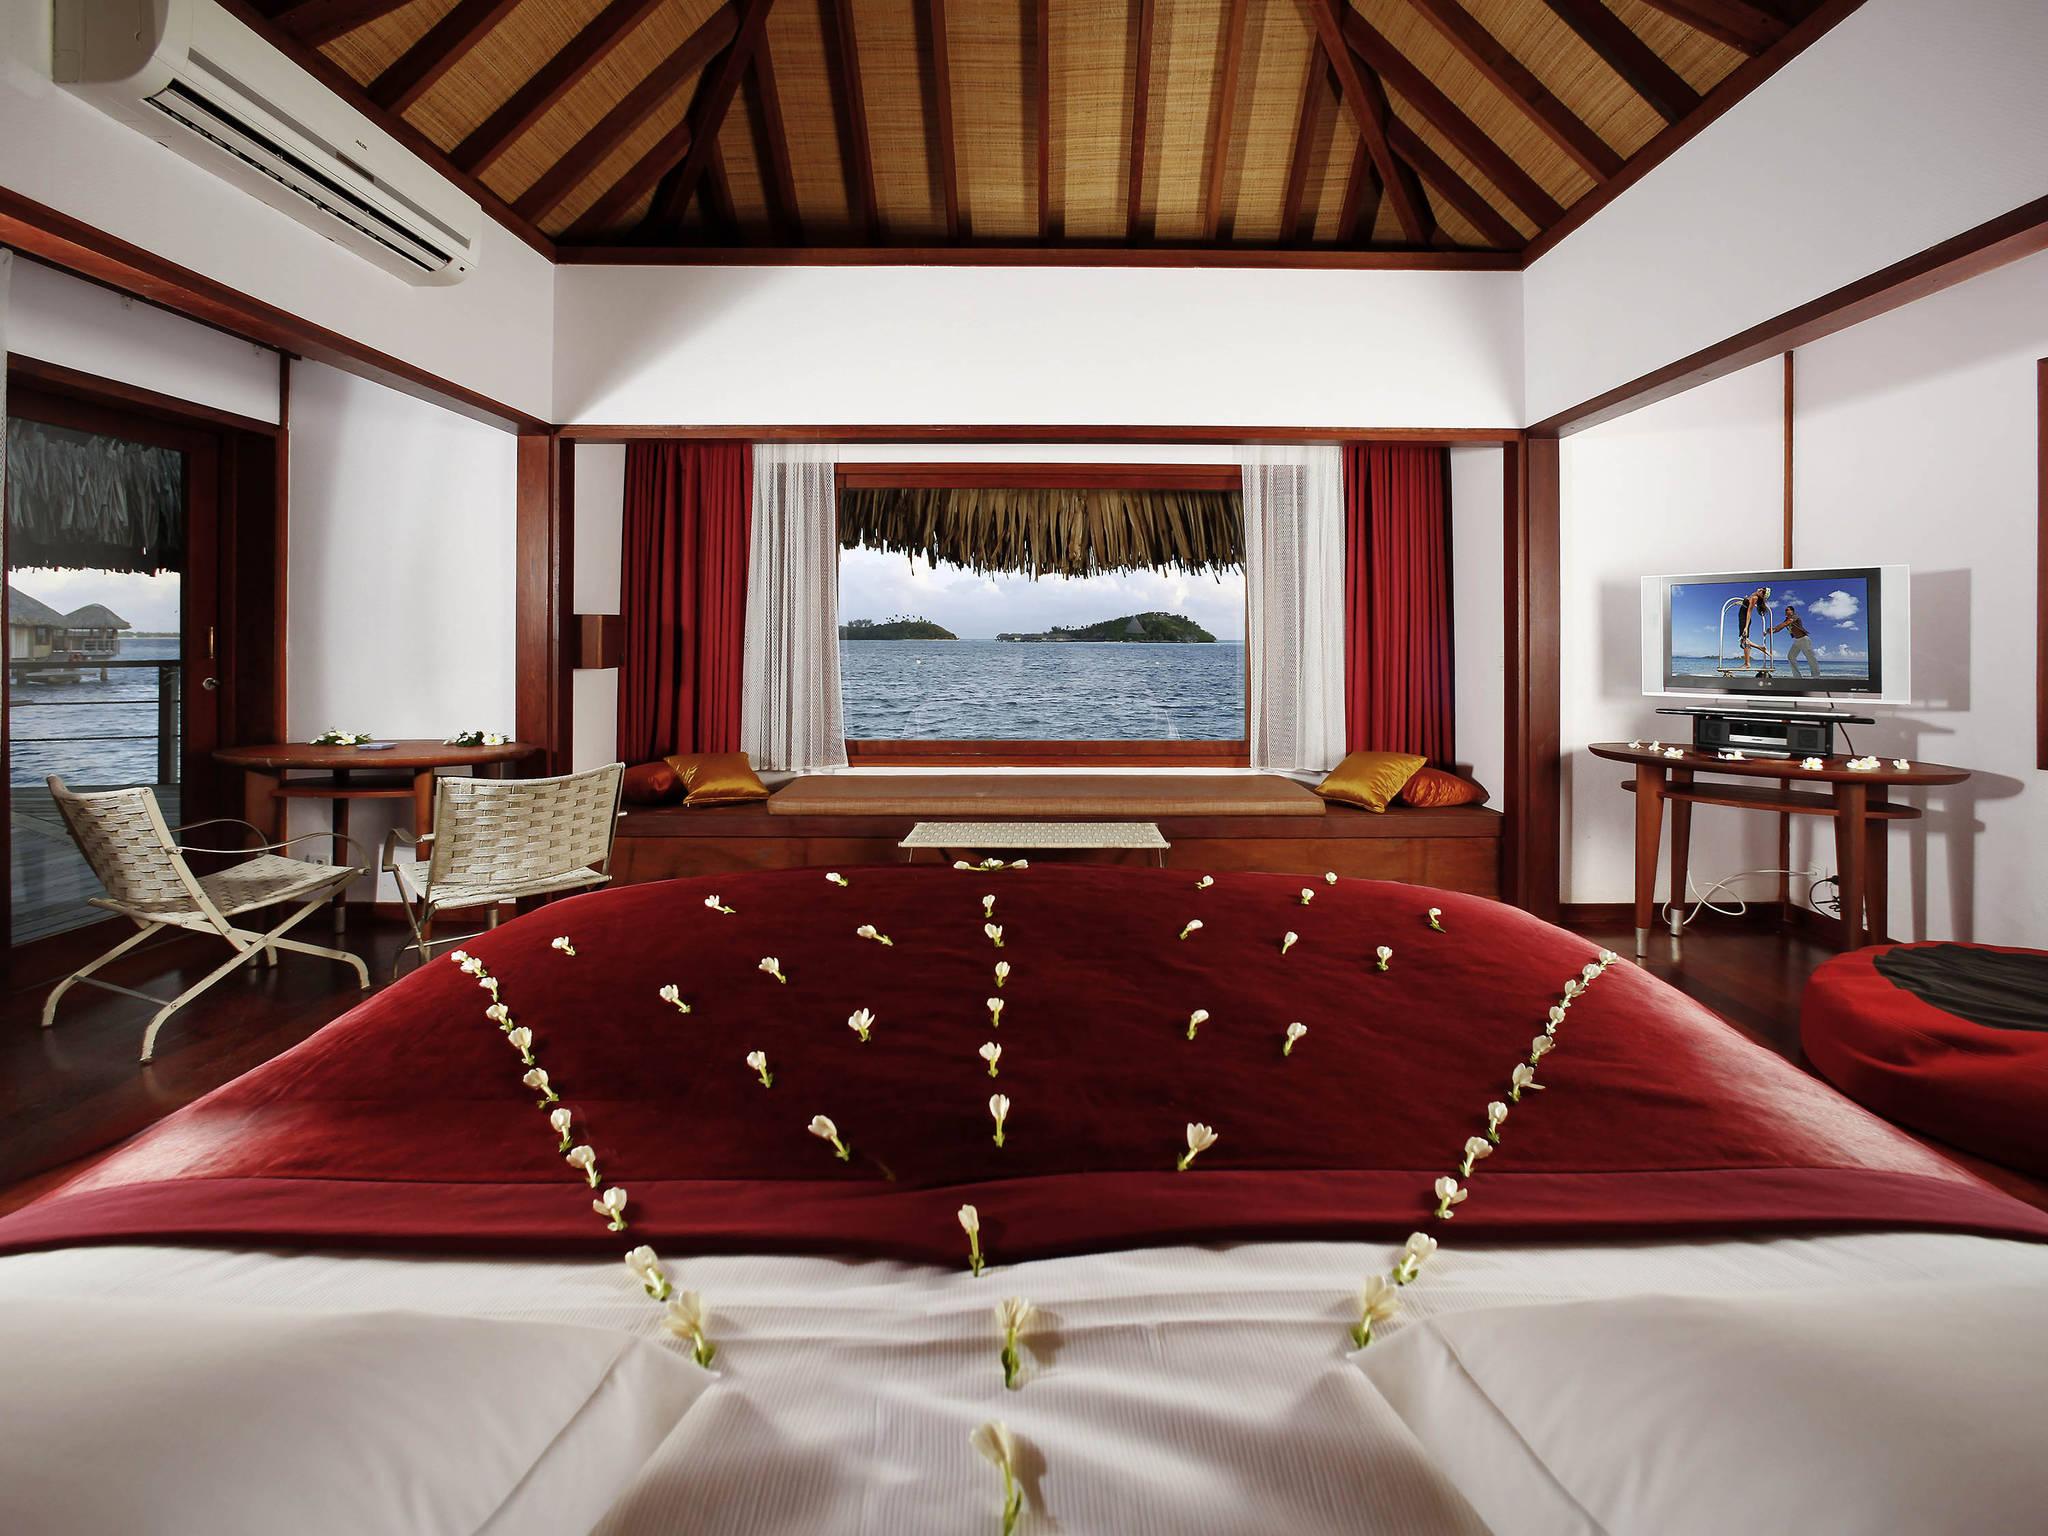 Sofitel Bora Bora Marara Beach Resort Hotel | AccorHotels.com